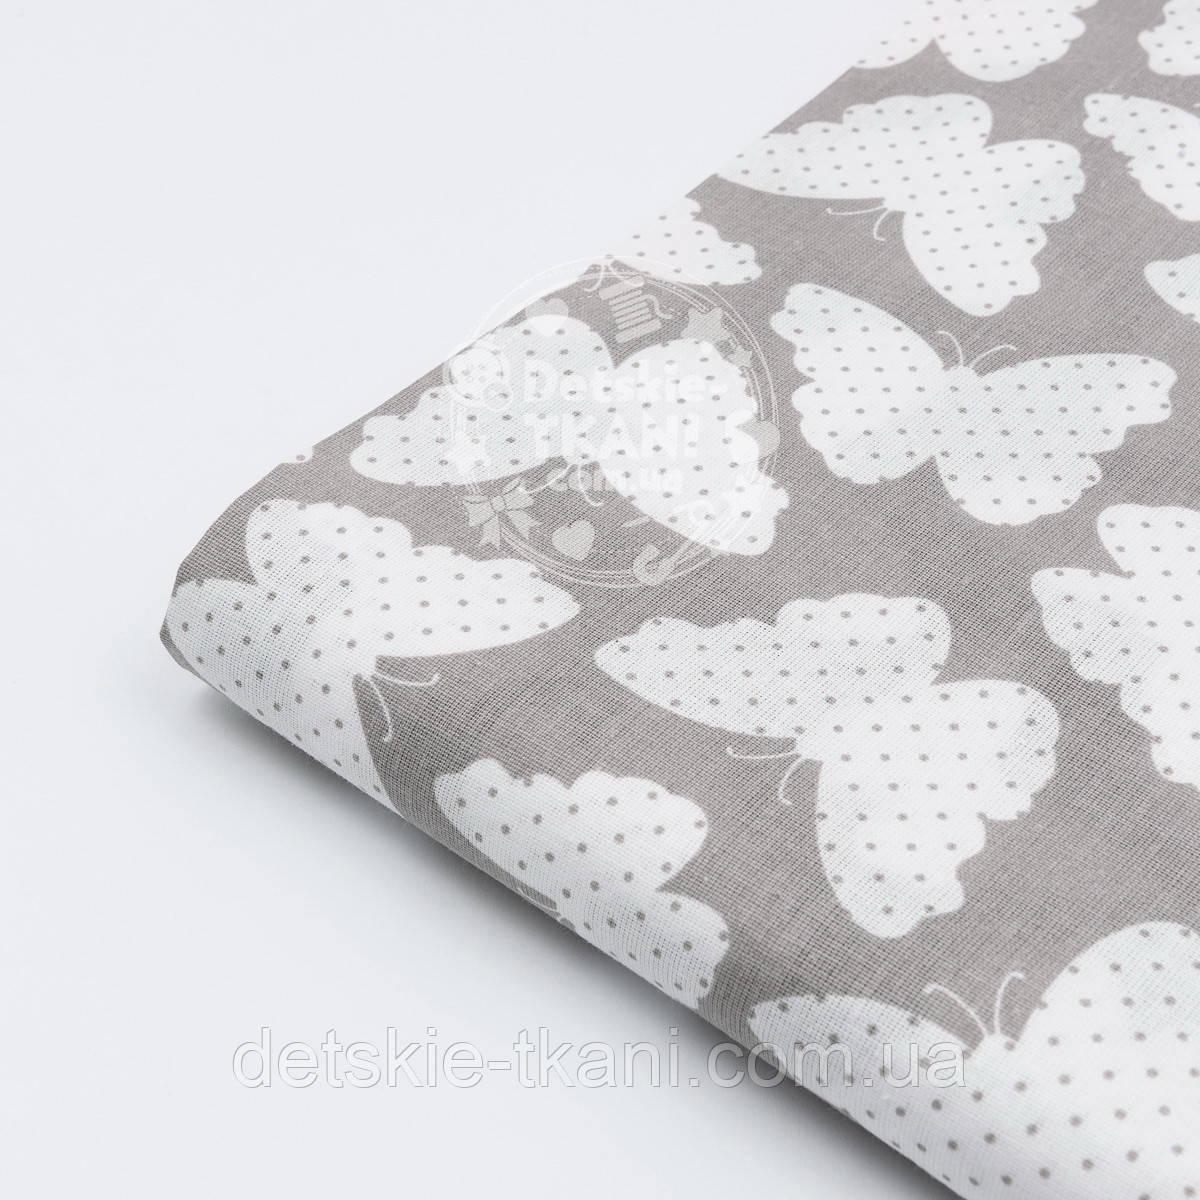 Лоскут ткани №2 размером 40*70 см